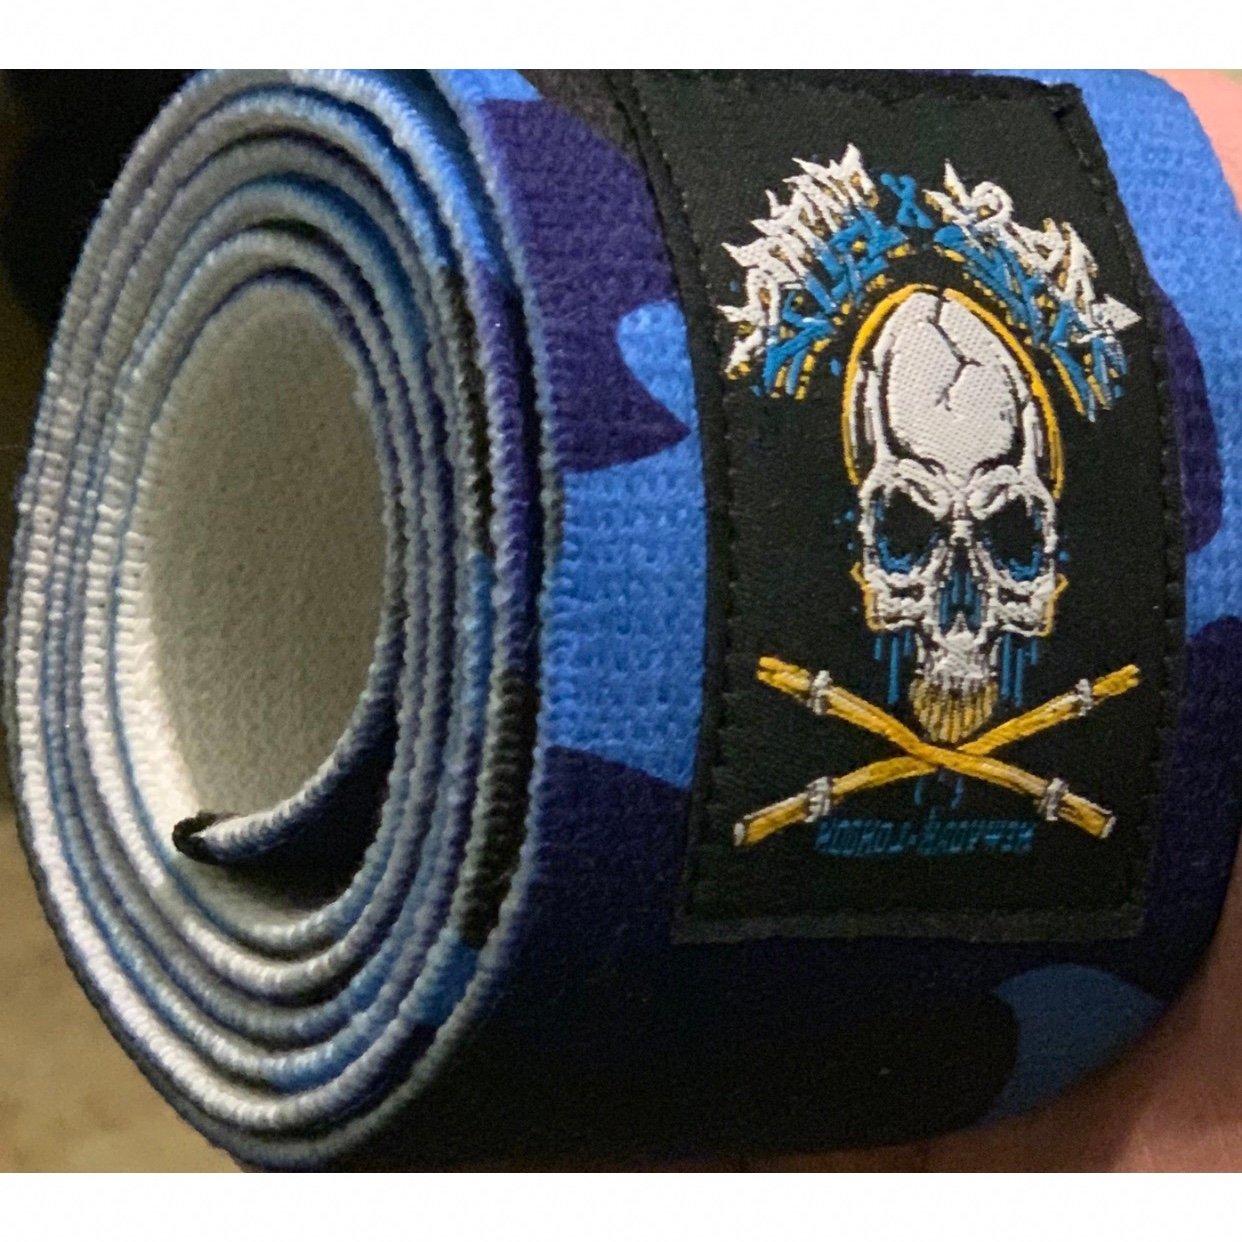 Image of Camo knee wraps